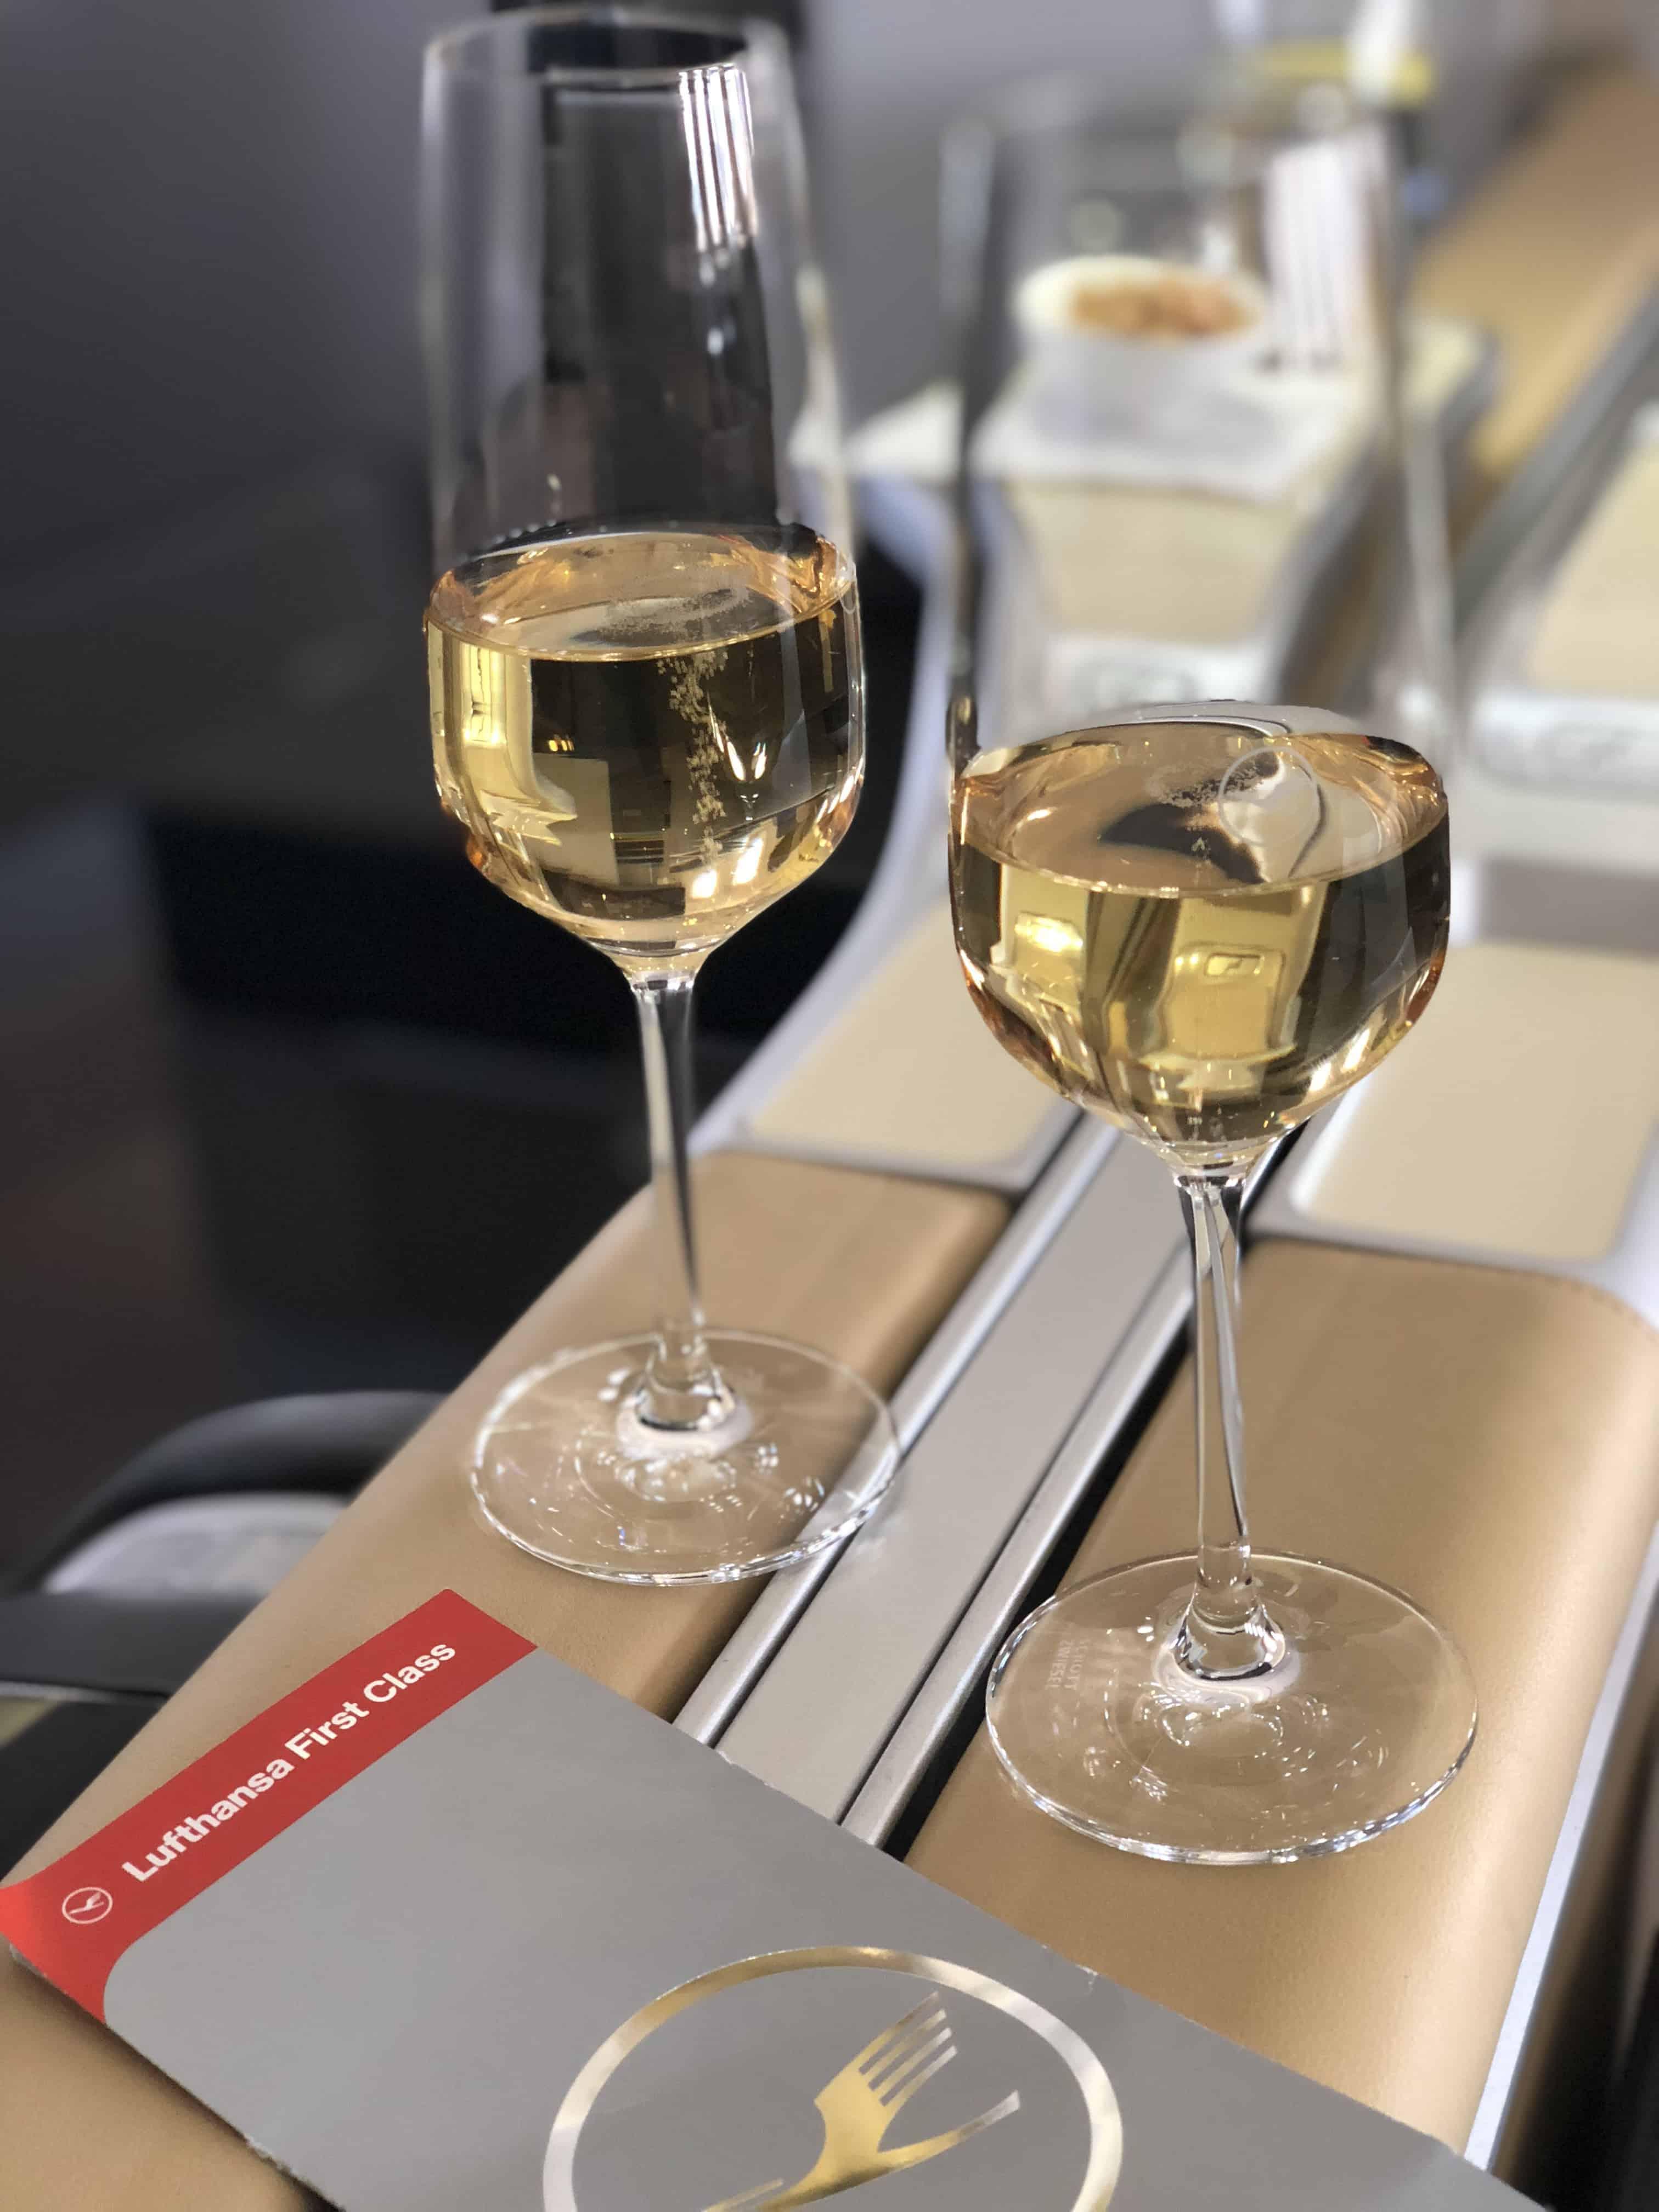 Lufthansa First Class Essen Champagner